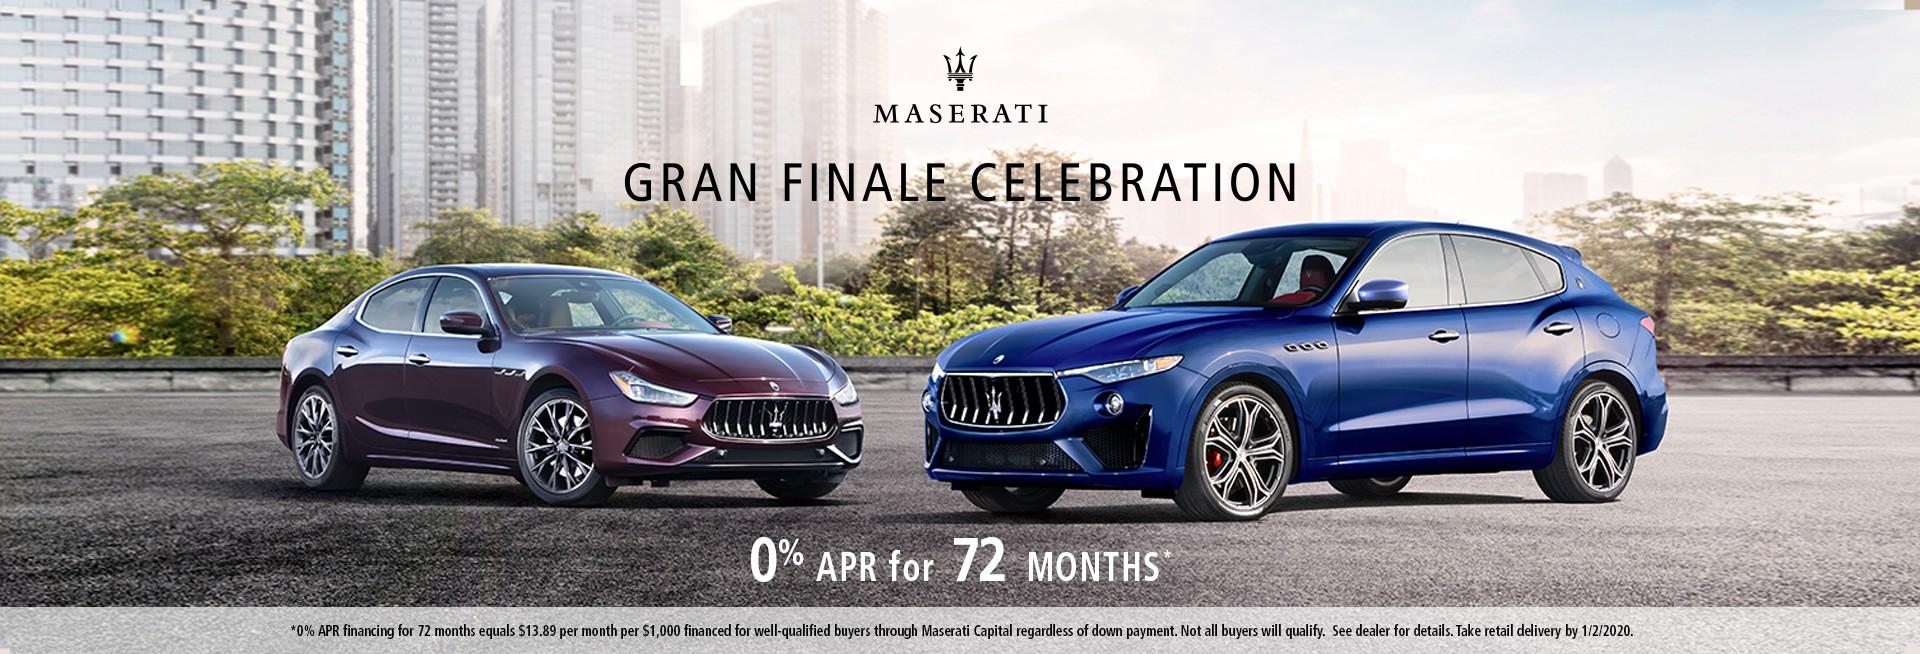 Gran Finale Celebration 0% APR for 72 Months